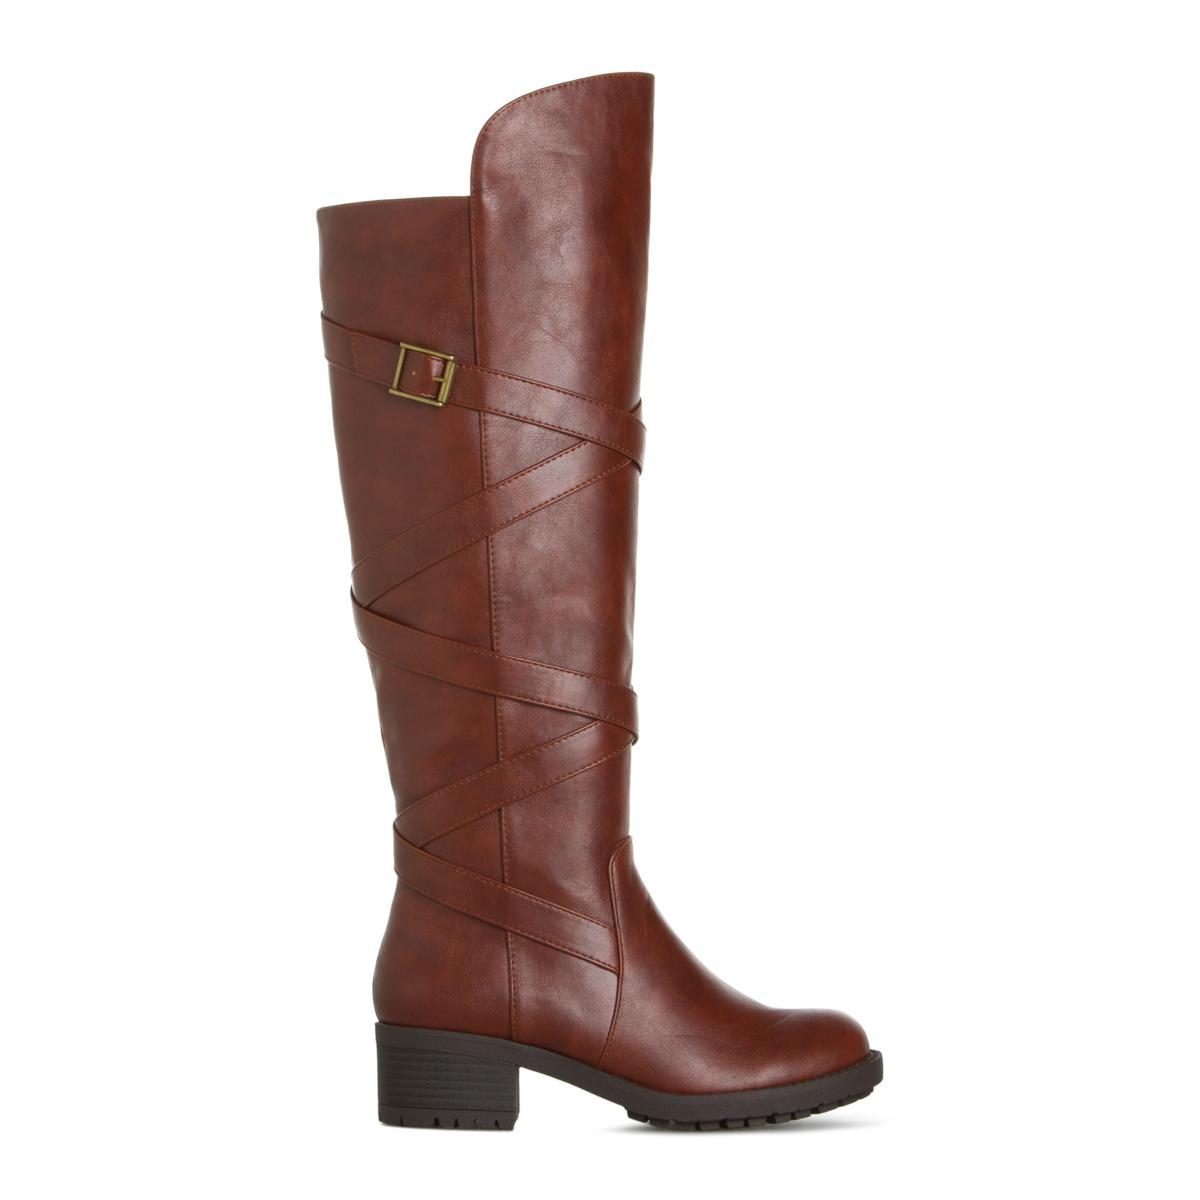 Women's Cowboy Boots, Black Riding Boots, Cheap Knee High Boots ...